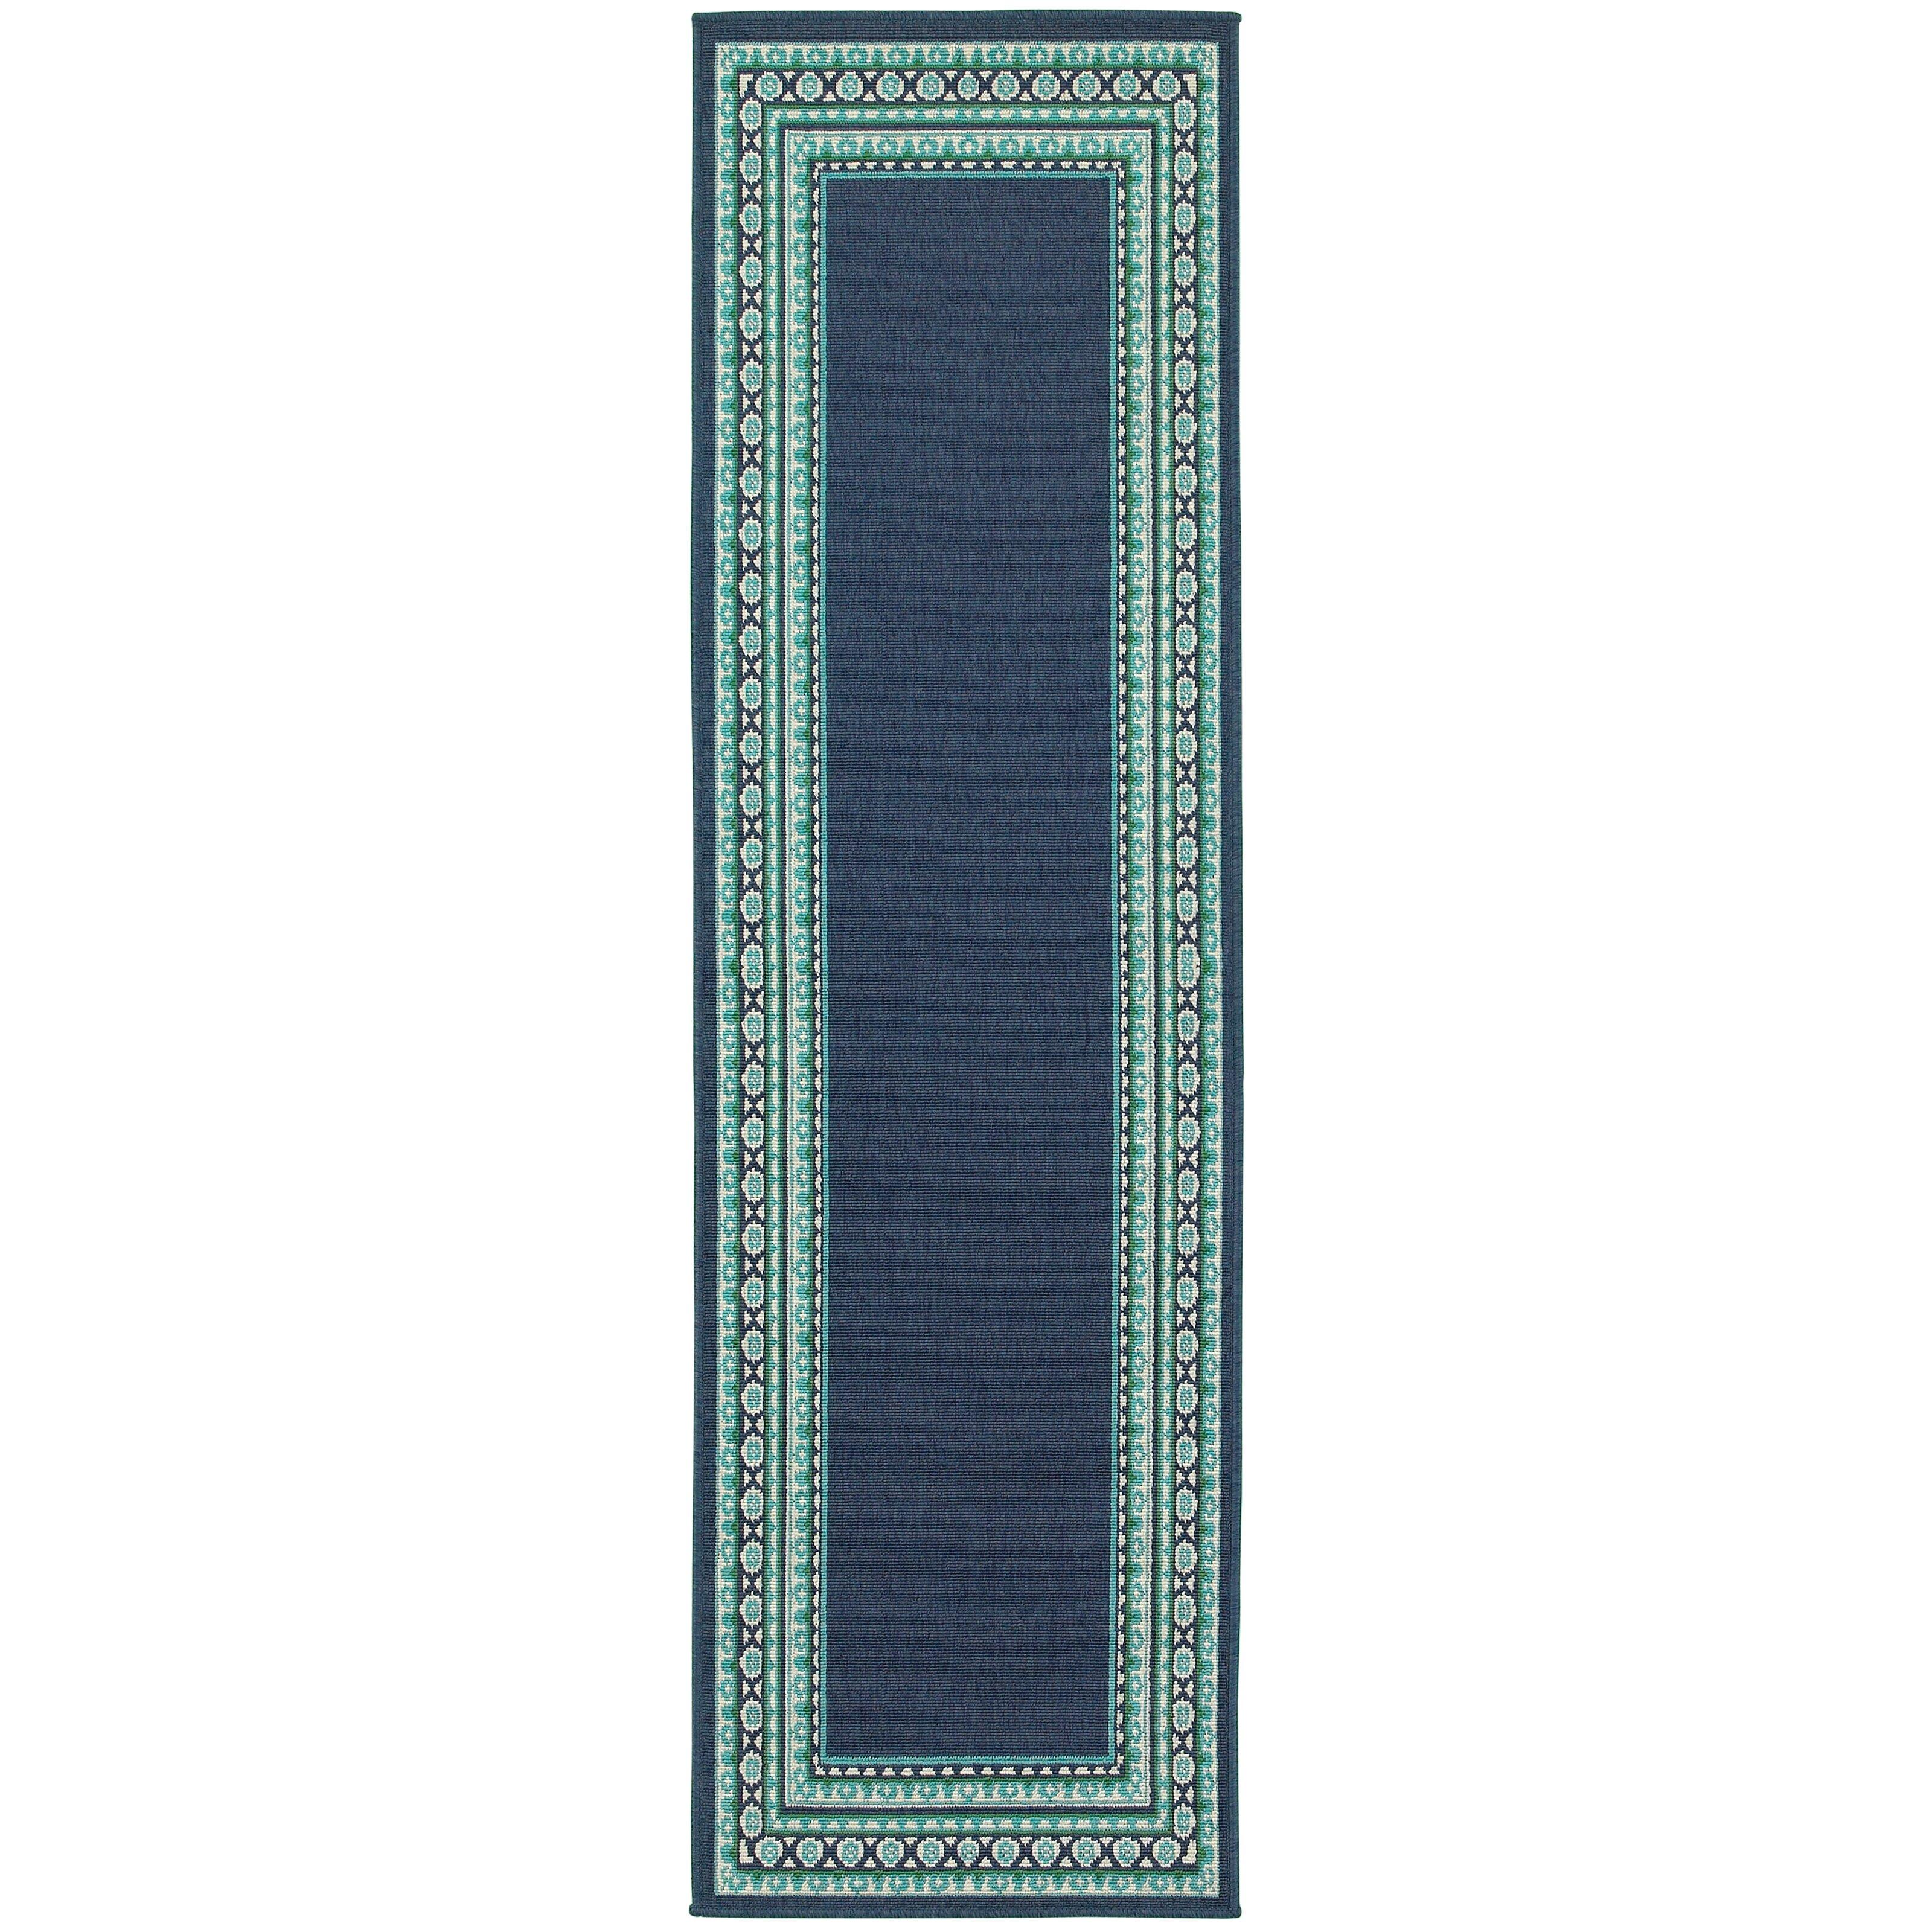 Green Navy Rug: Threadbind Cortlandt Navy/Green Indoor/Outdoor Area Rug